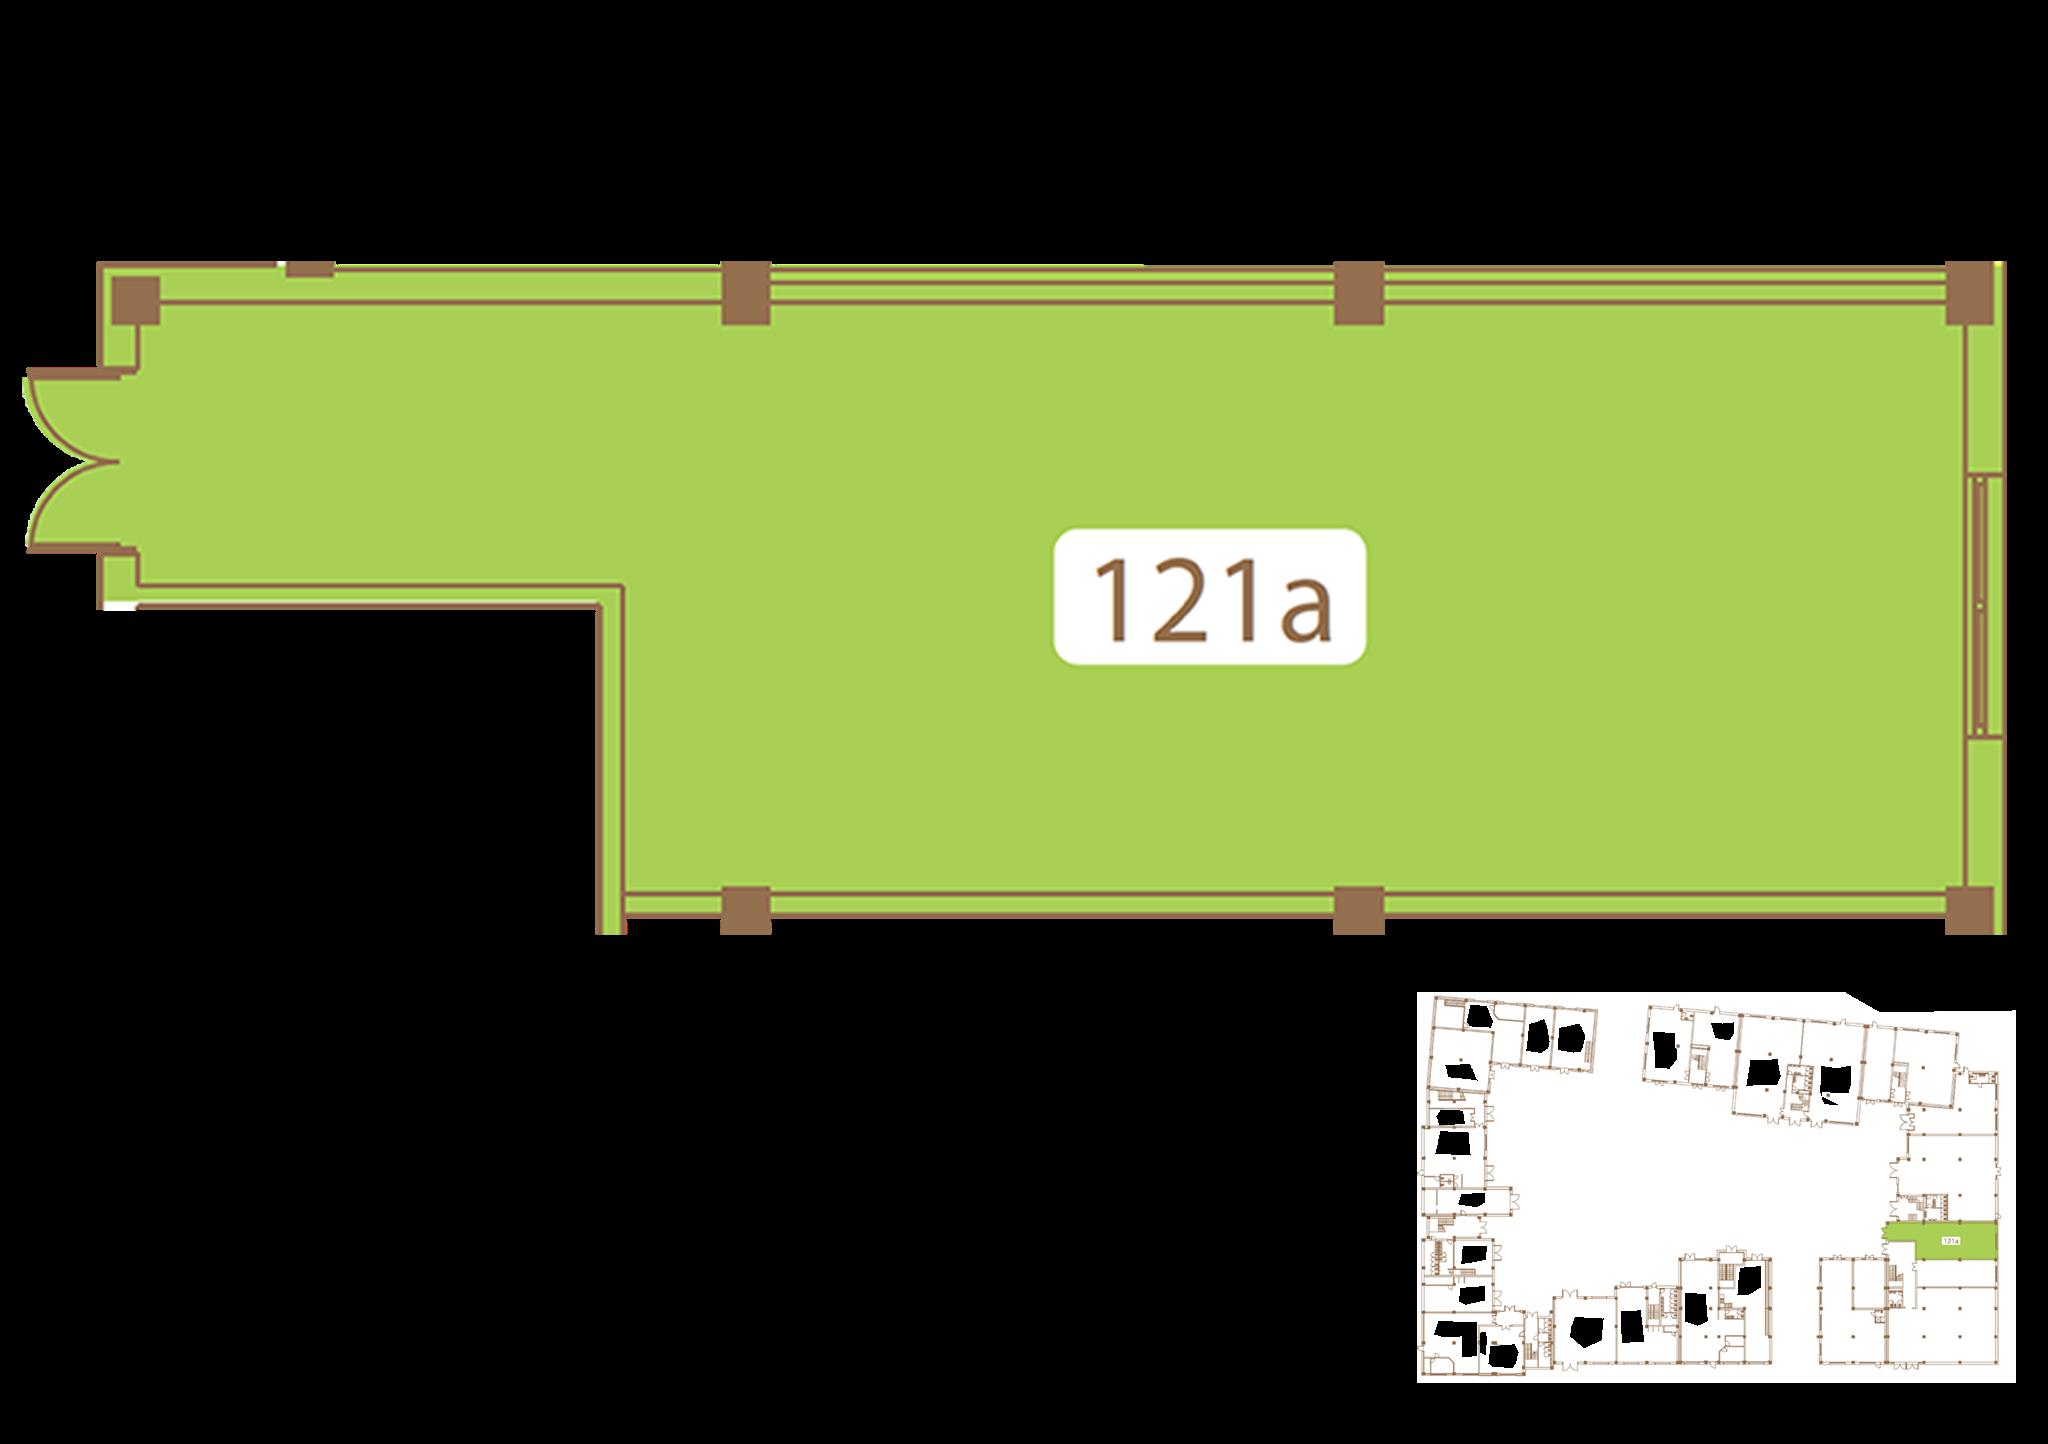 121a1